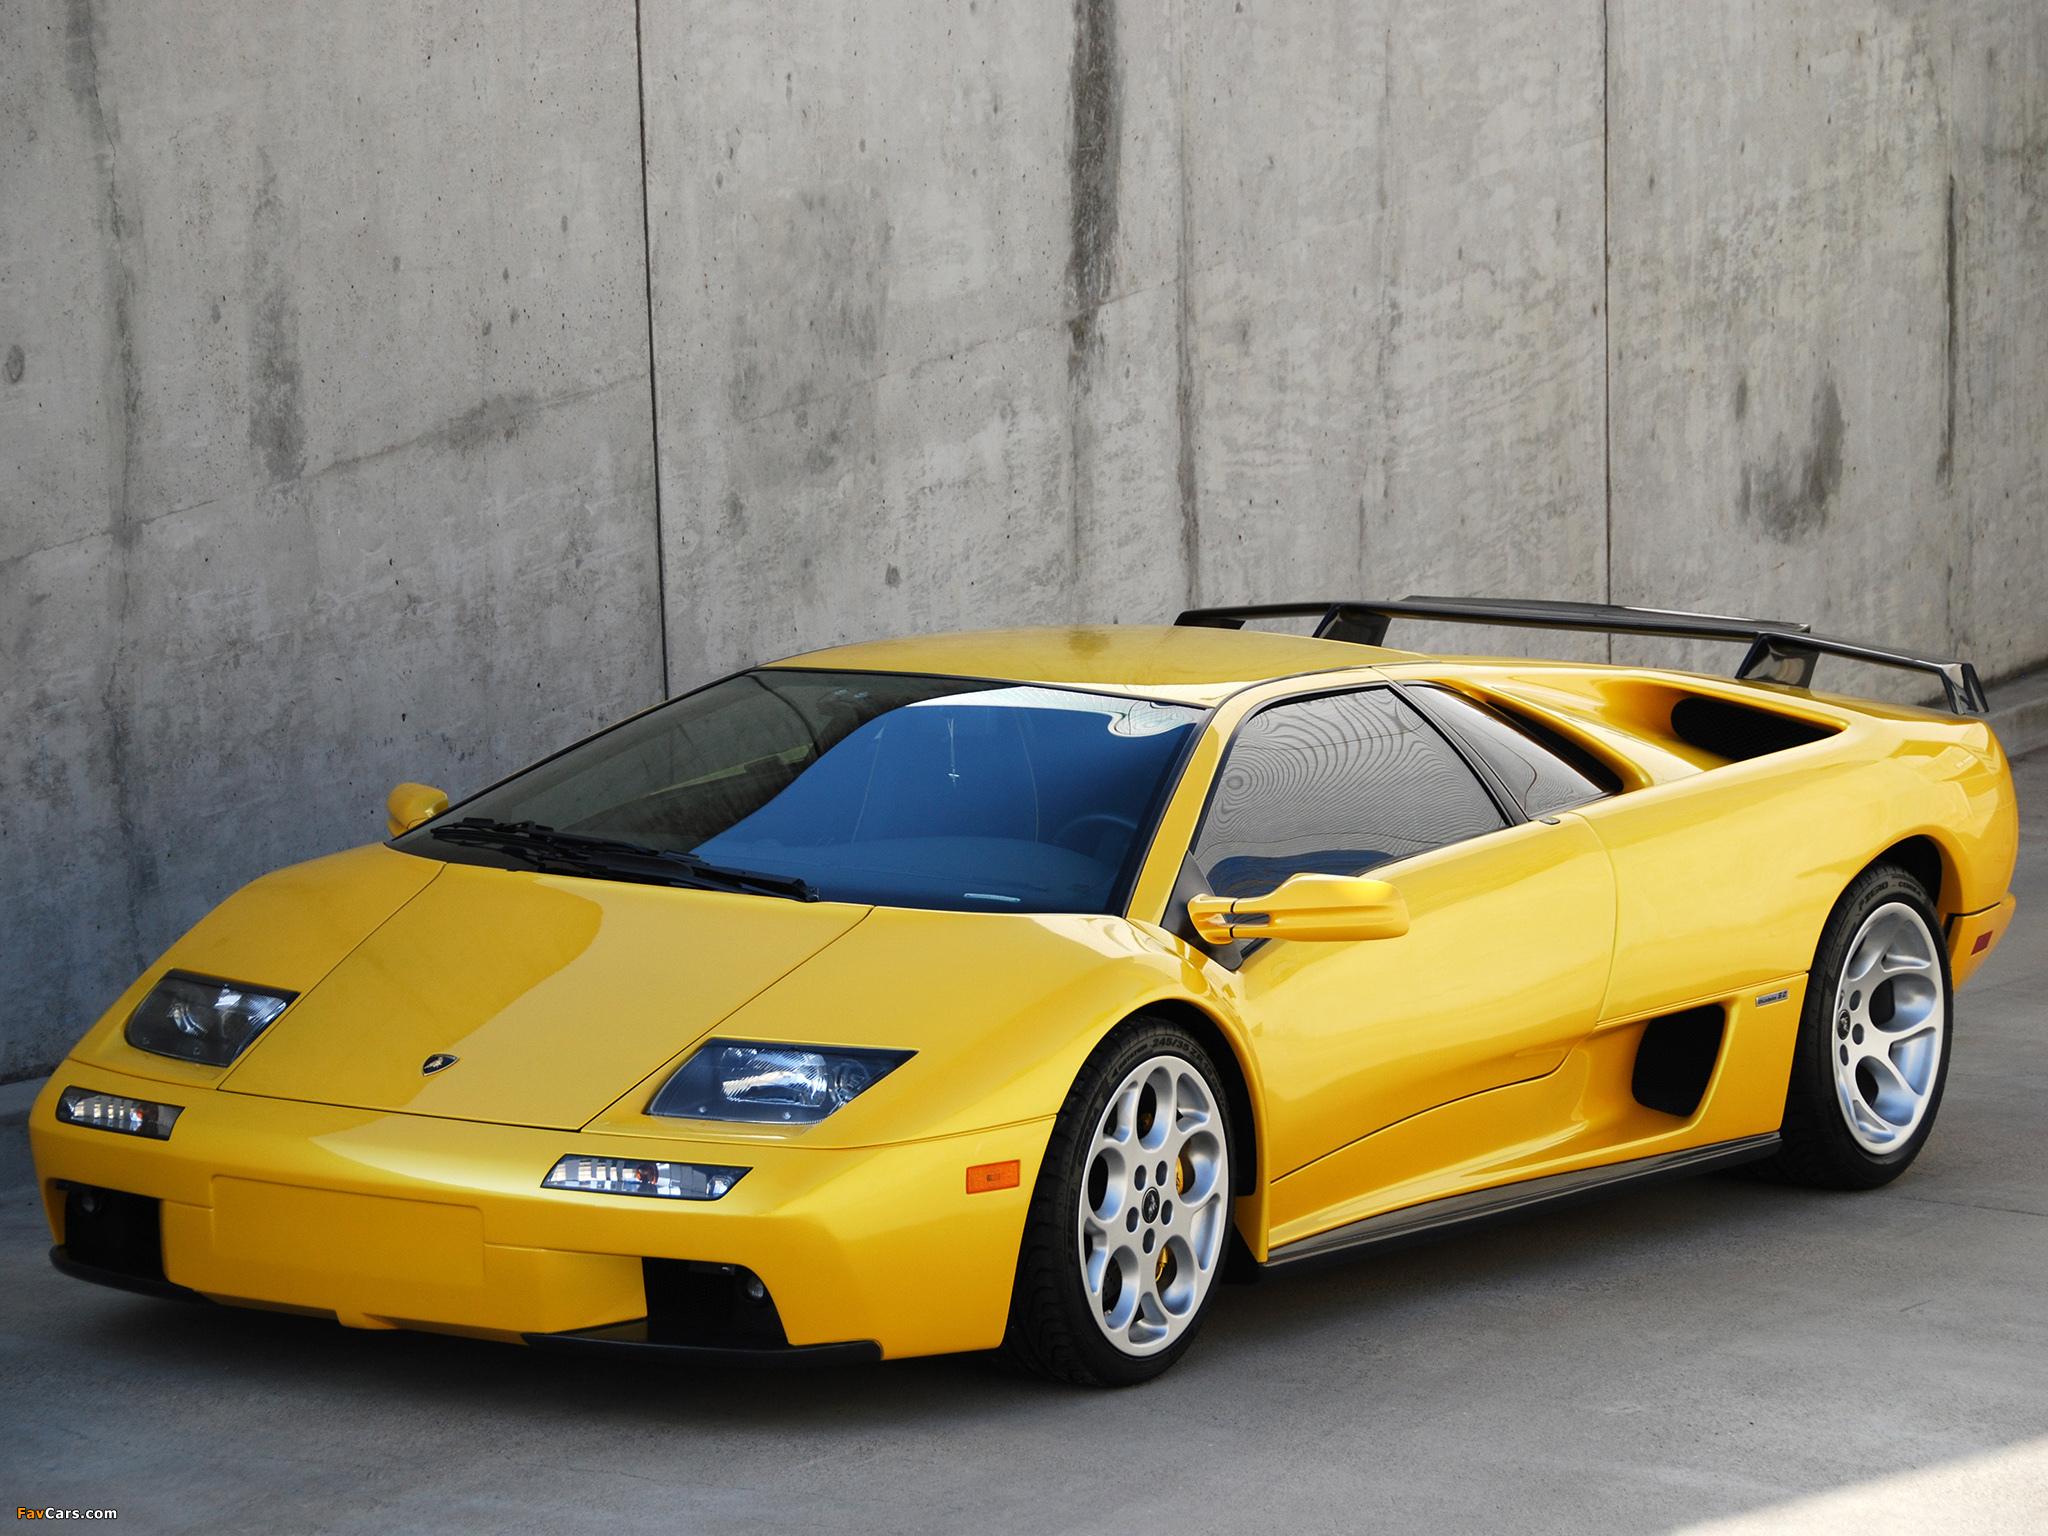 Lamborghini Diablo Vt 6 0 2000 01 Wallpapers 2048x1536